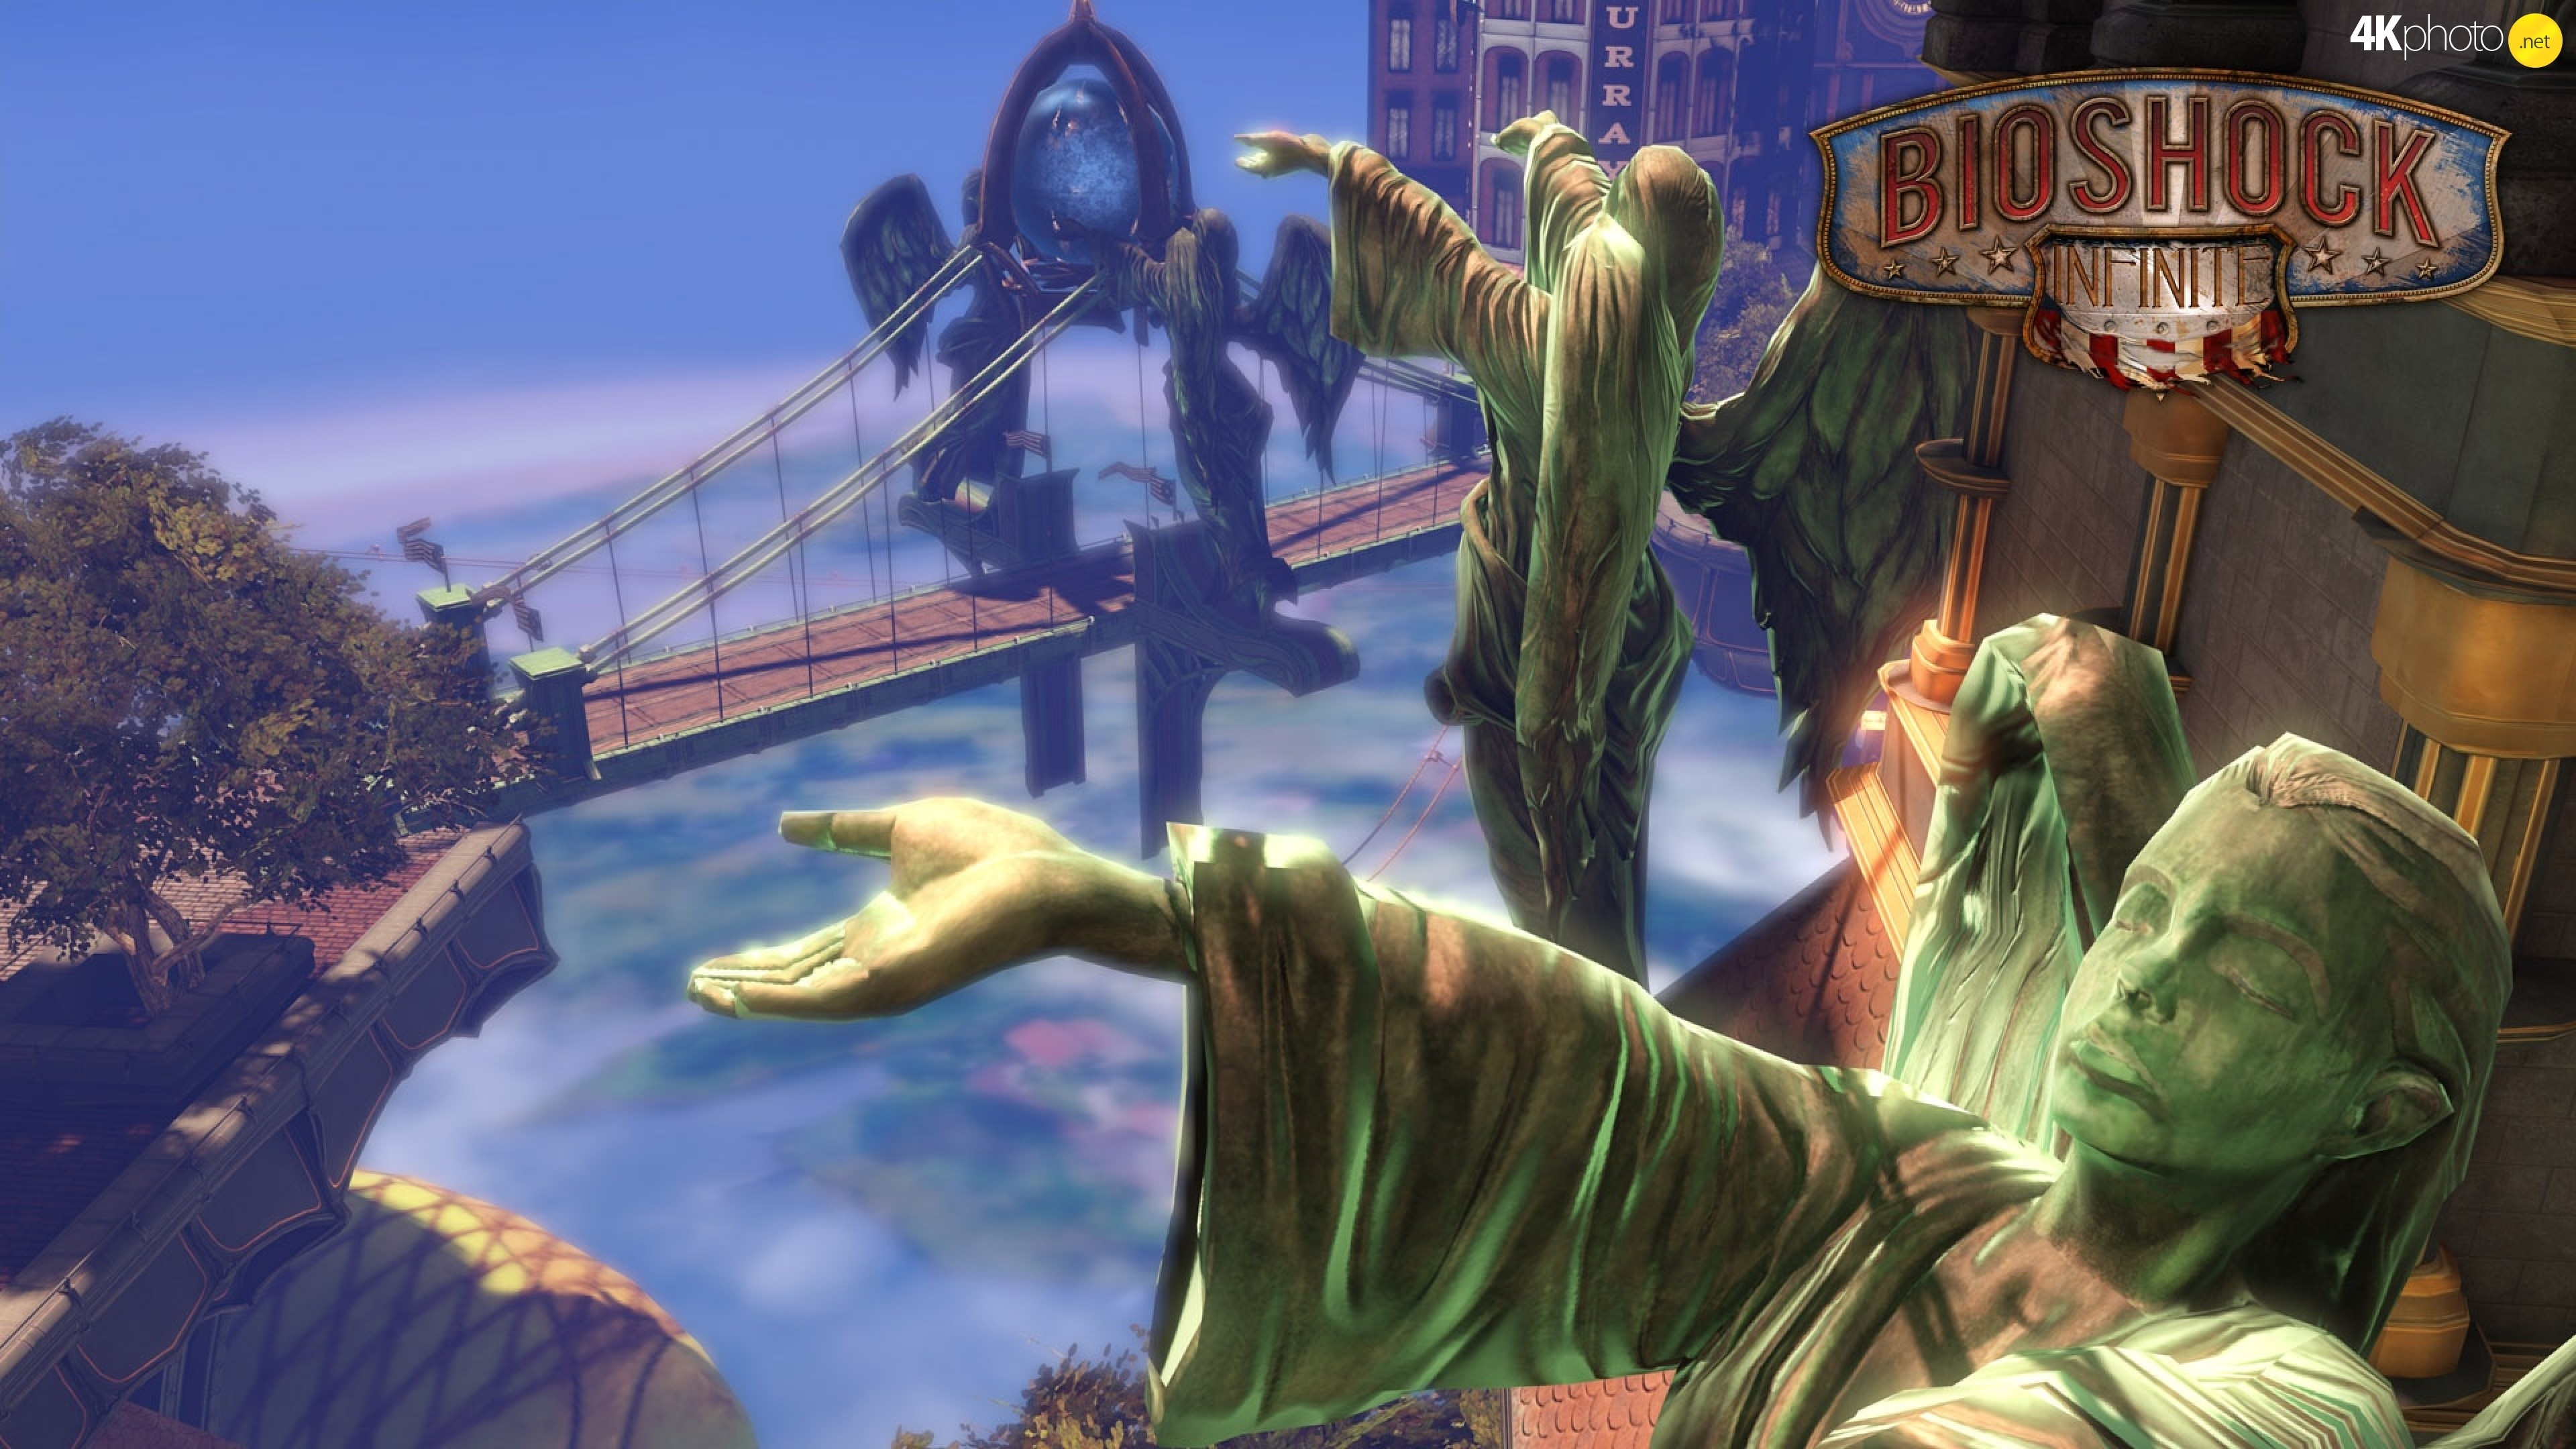 Columbia, Angels, Bioshock Infinite, statues